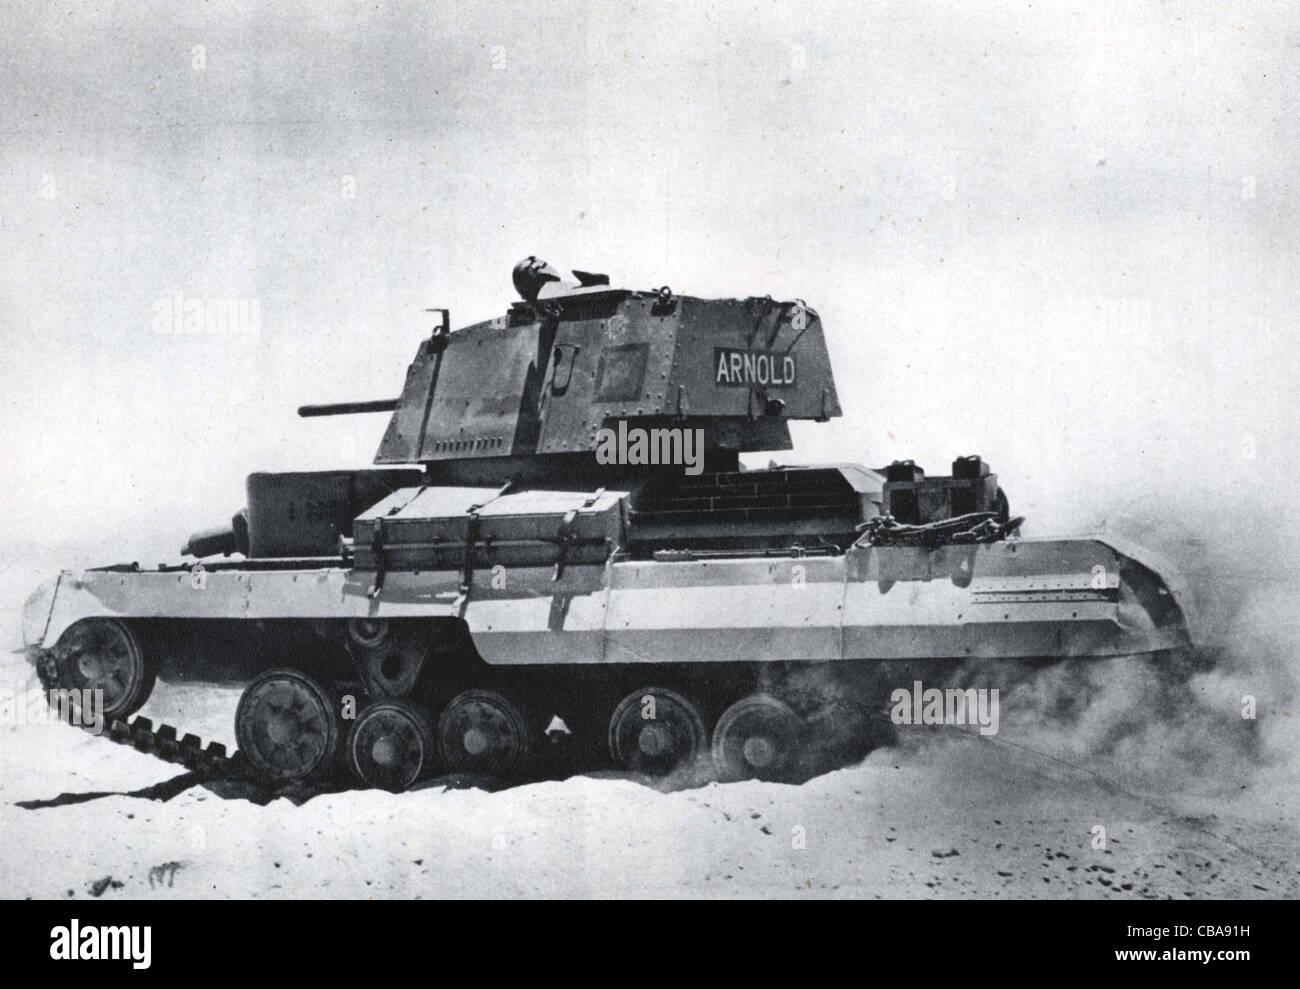 British WW11 Valentine cruiser tank. North Africa. - Stock Image